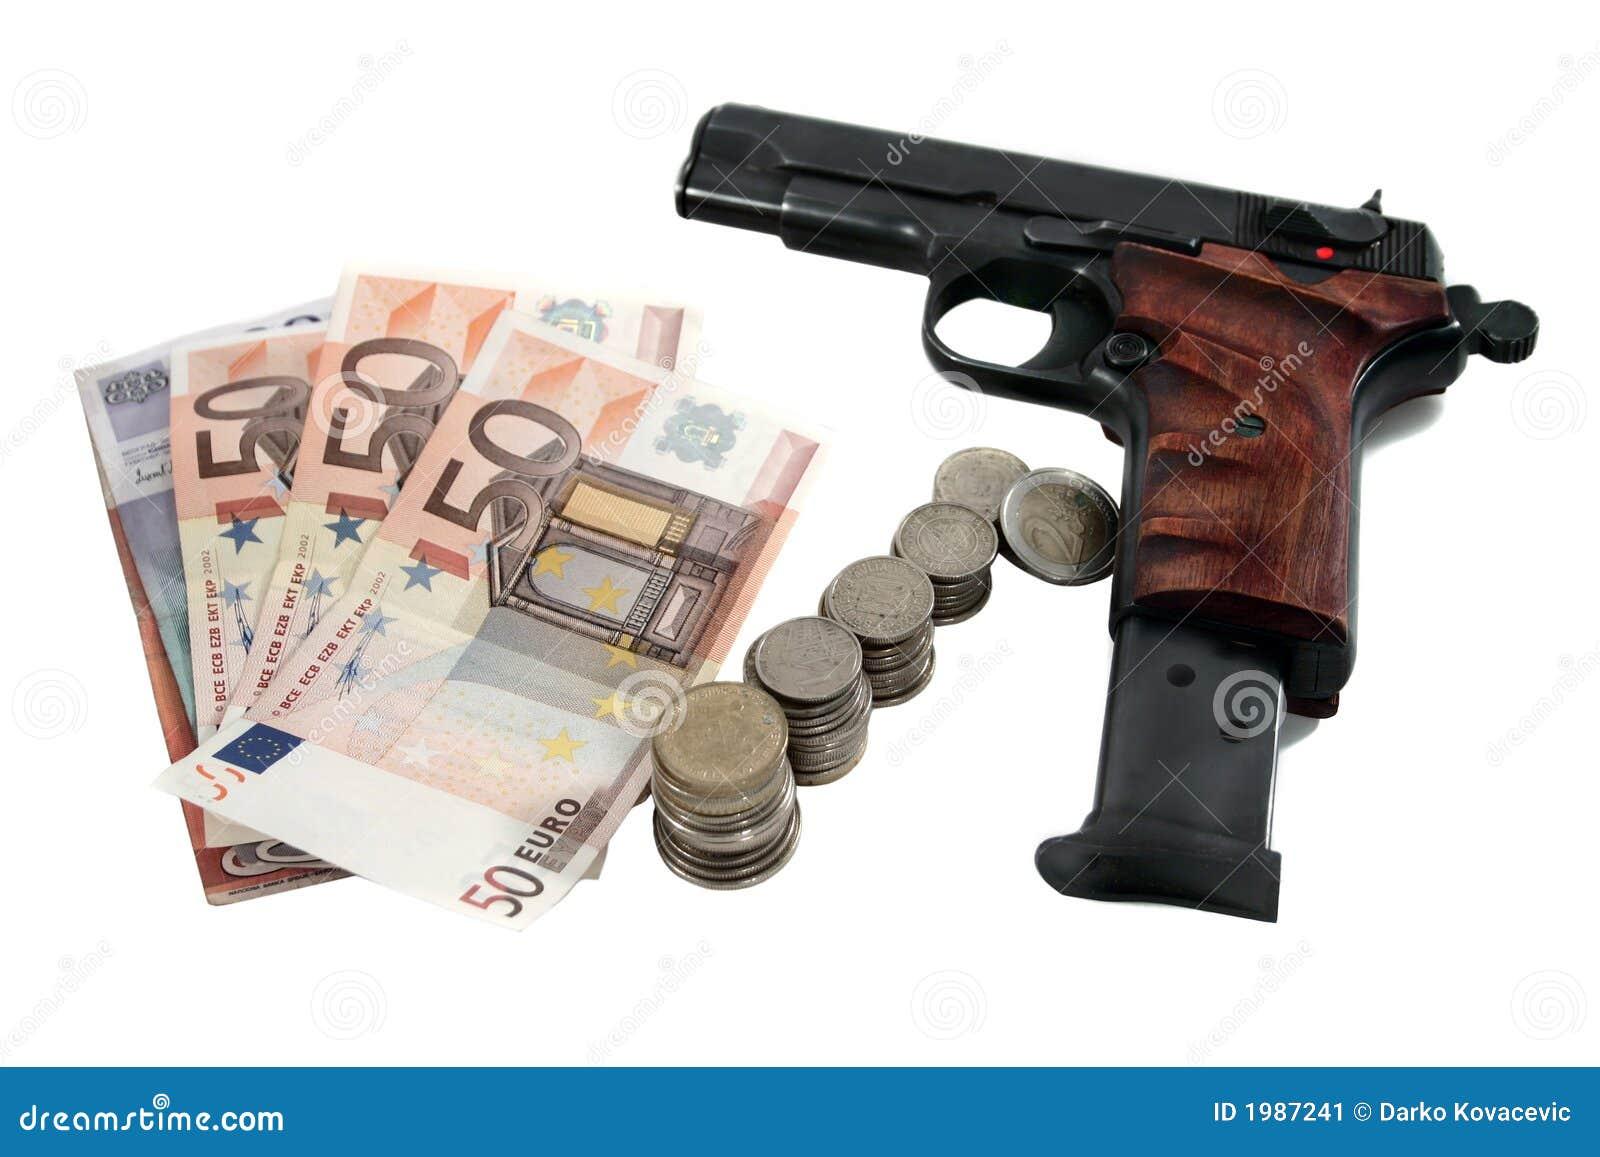 Pengarpistol